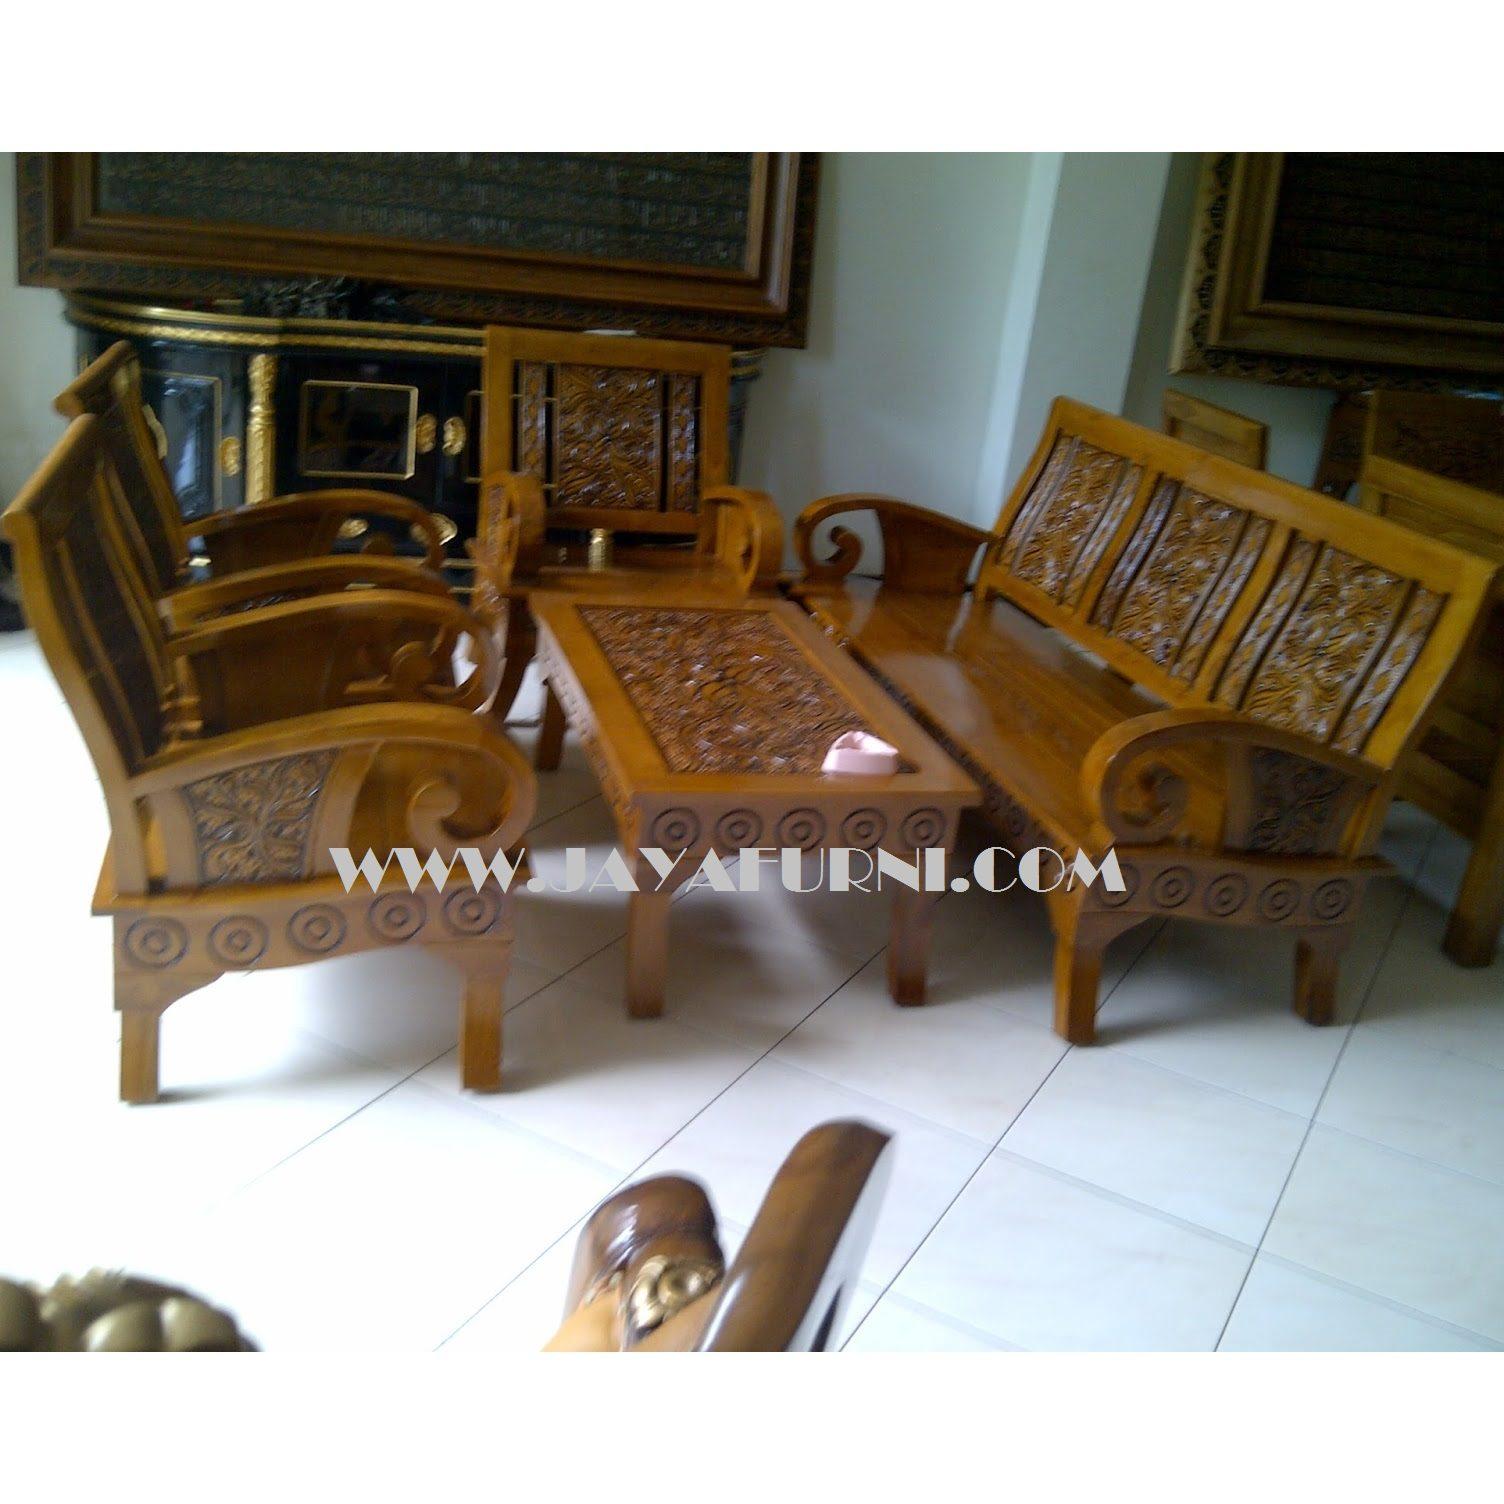 Kursi Tamu Minimalis Harga 2 Jutaan Arsip Toko Furniture Online